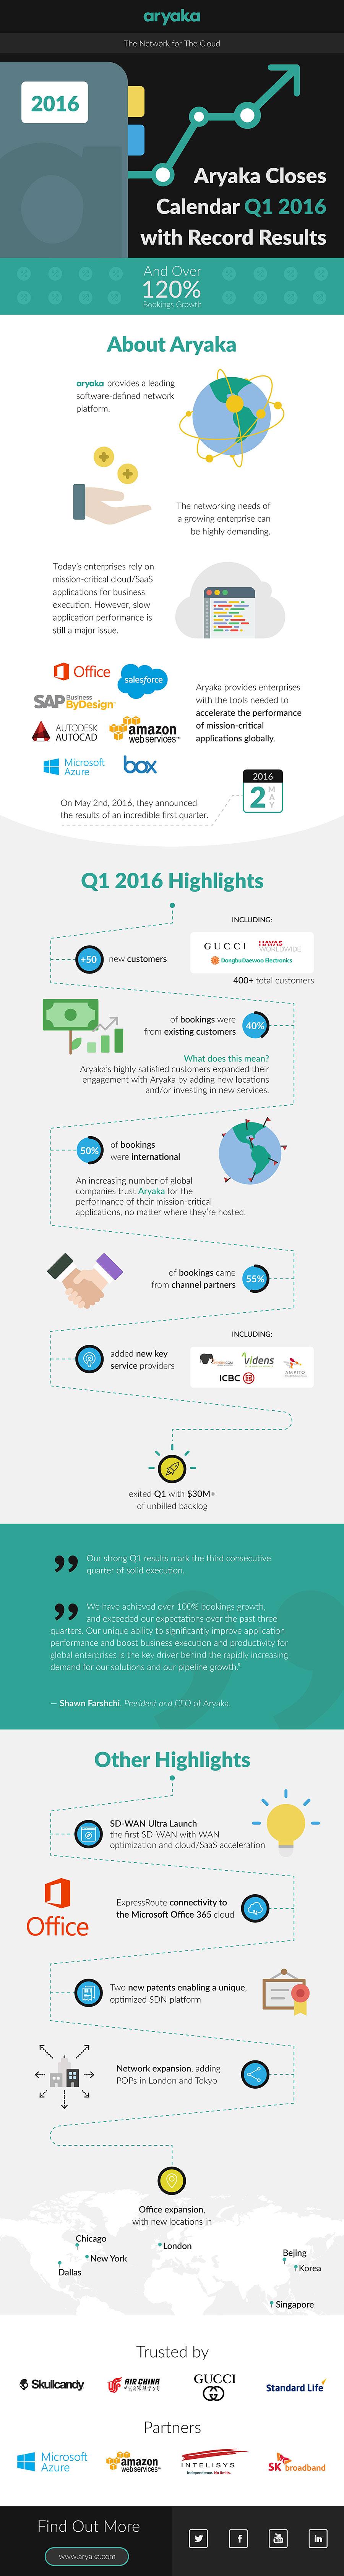 Infographic-Momentum